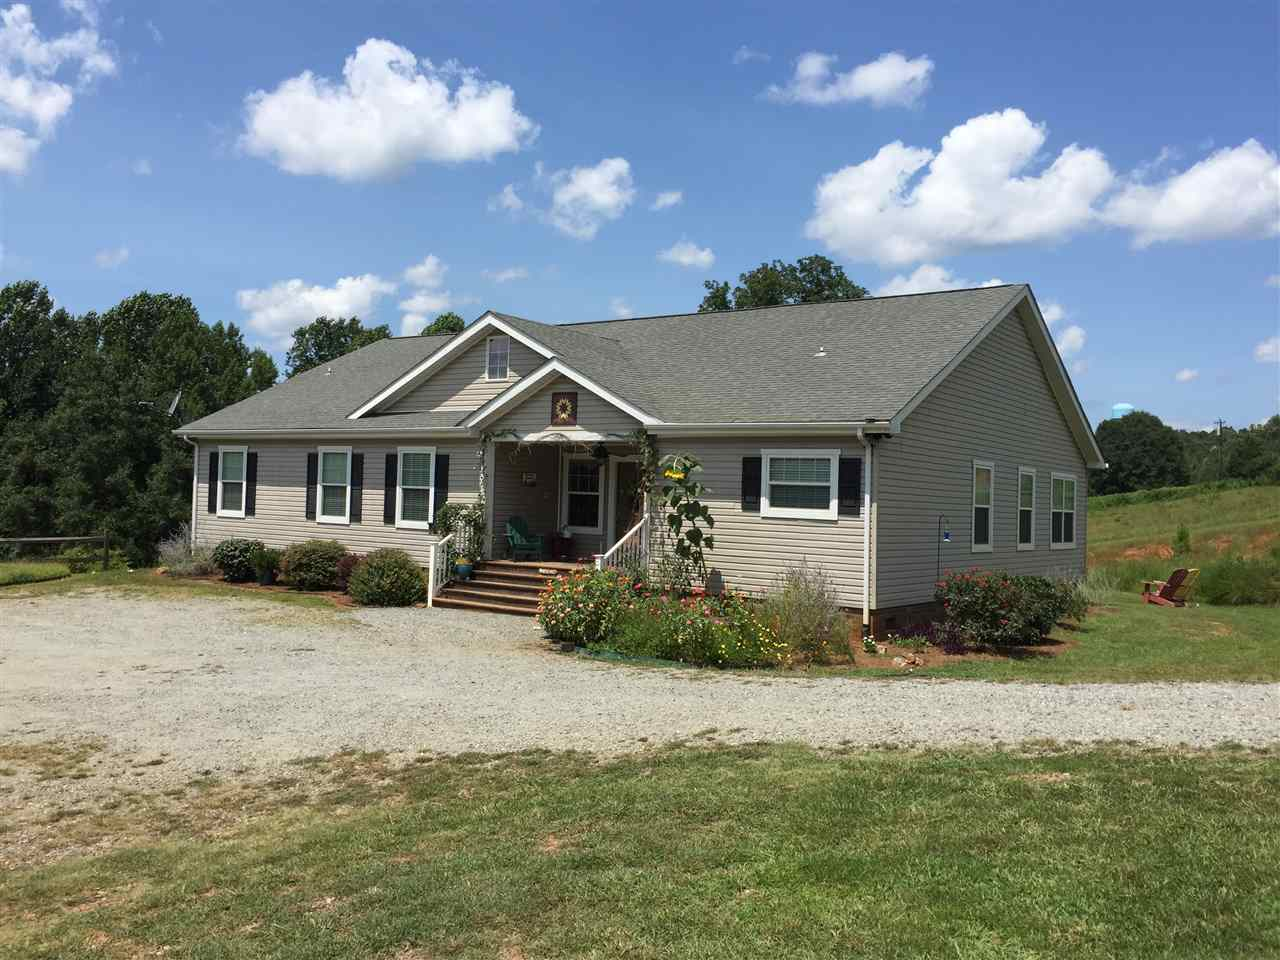 182 Isham Drive, Bostic, NC 28018